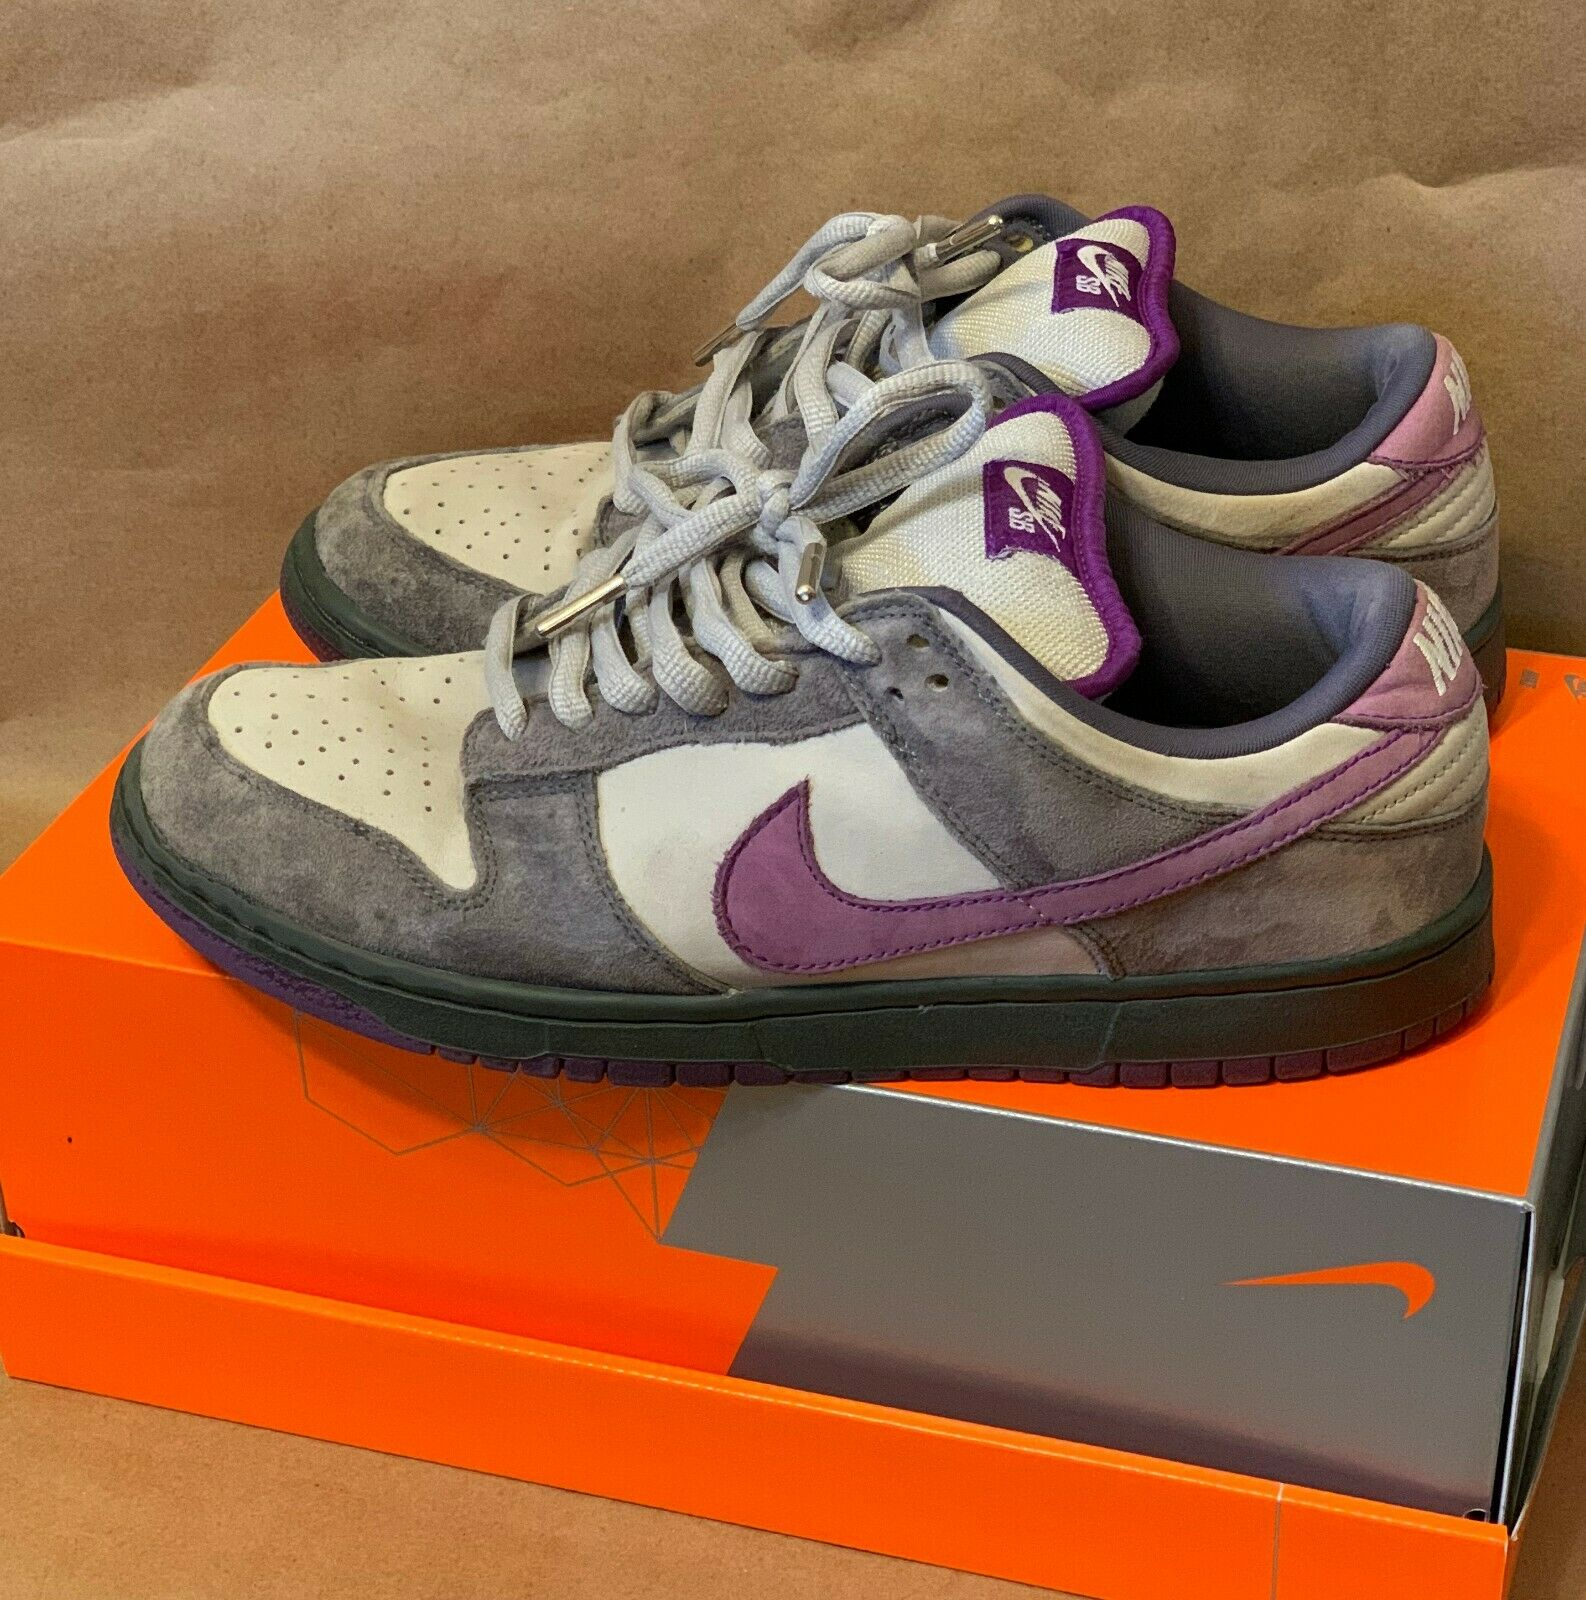 Nike SB Dunk Low Premium Purple Pigeon 2006 Size 11 AUTHENTIC – NO RESERVE